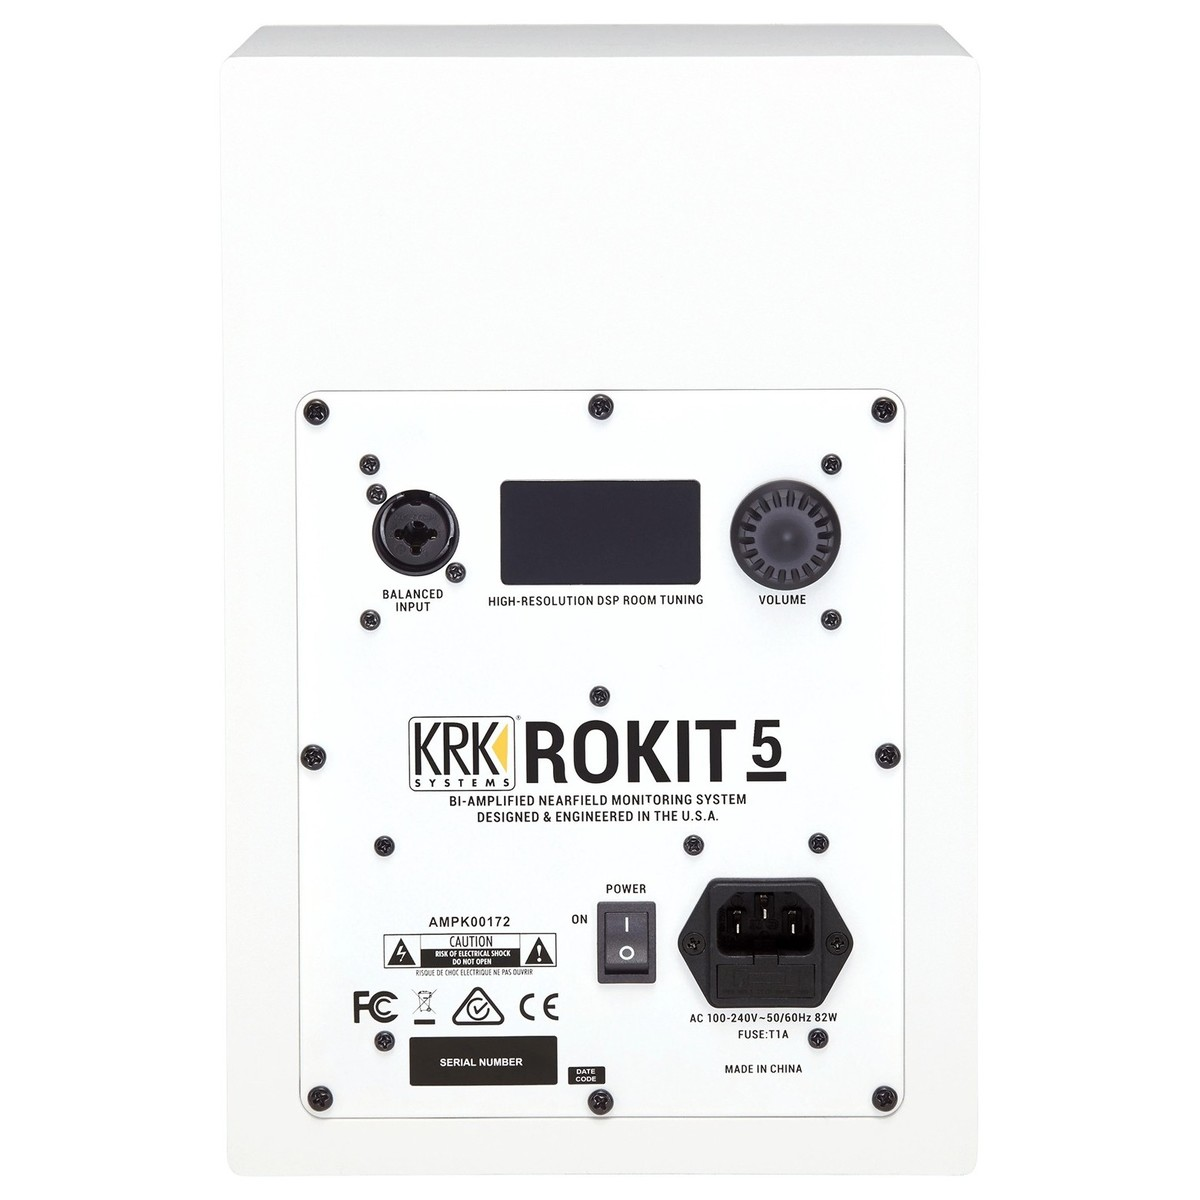 KRK RP5-G4W ROKIT MONITOR DA STUDIO 55 WATT BIAMPLIFICATO WOOFER 5 BIANCO + DSP ROOM TUNING TRAMITE APP 1